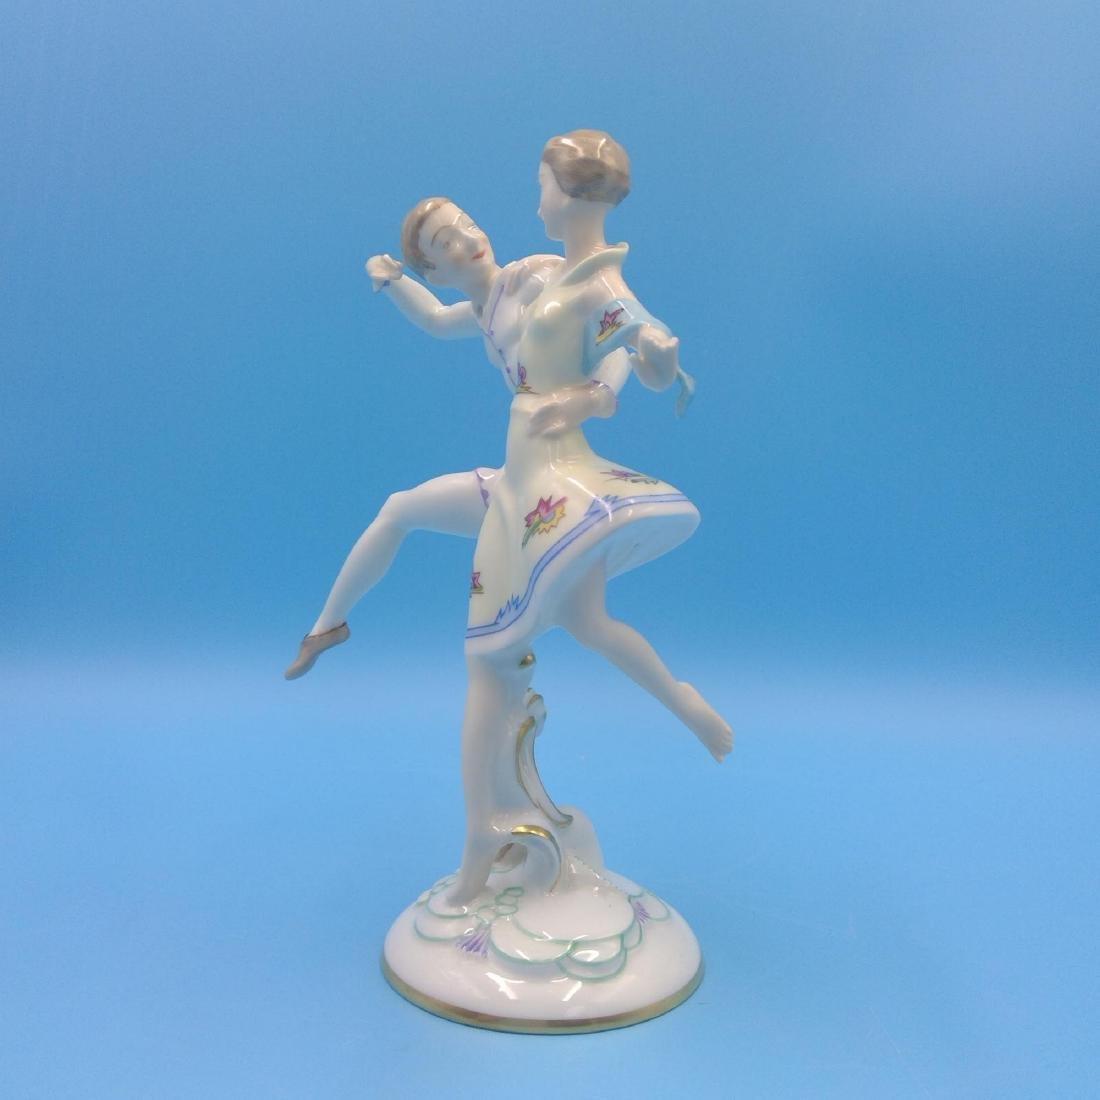 HUTSCHENREUTHER GERMAN PORCELAIN FIGURINE DANCERS - 2